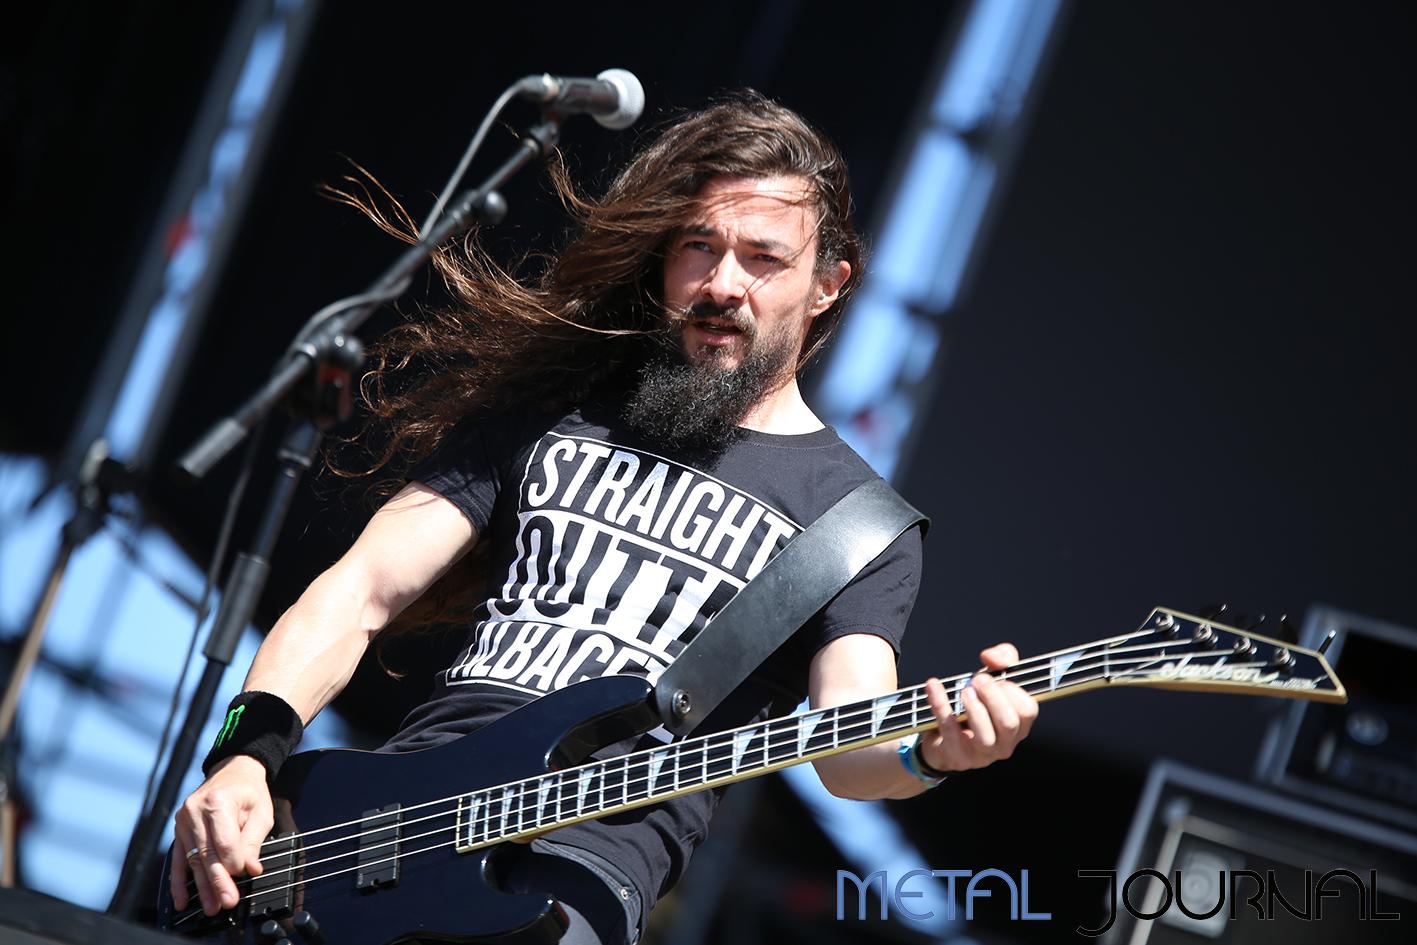 angelus apatrida metal journal rock the coast 2019 pic 3